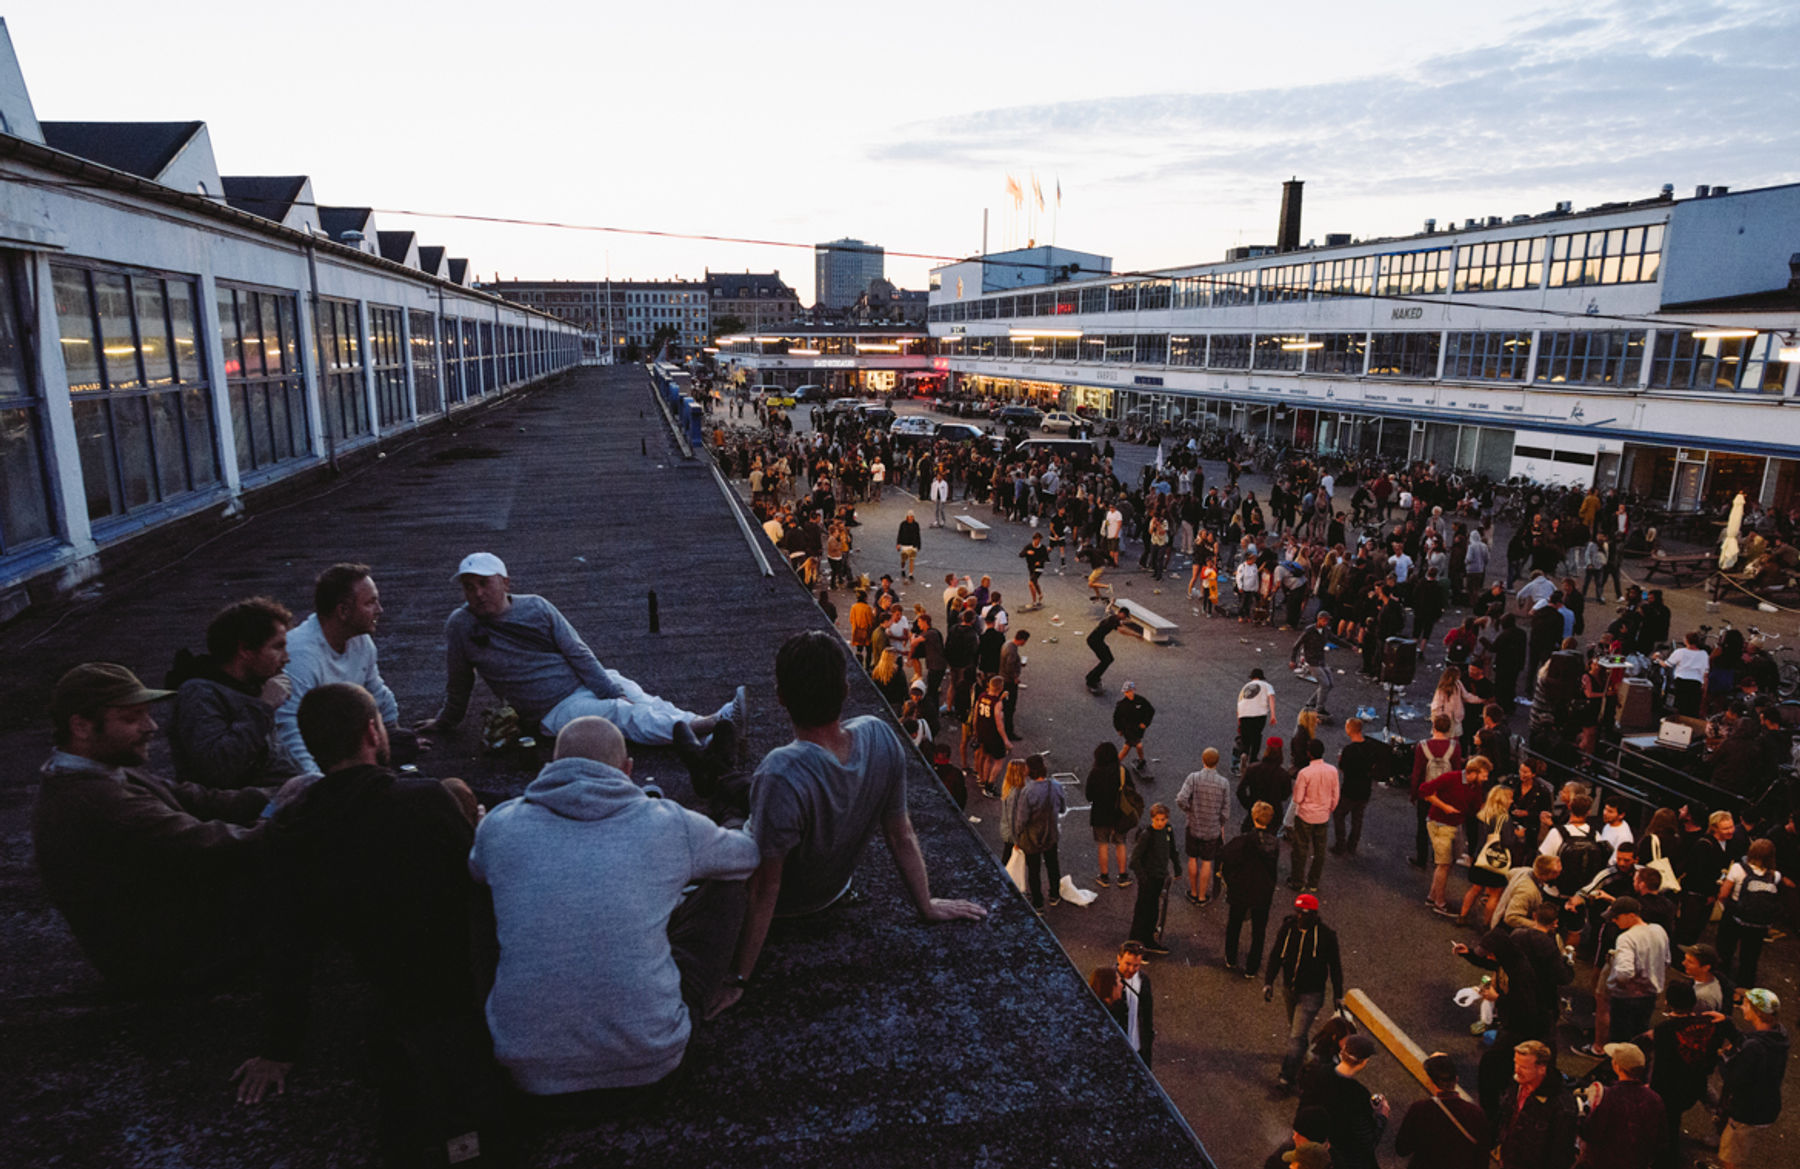 _IHC4512e-Nike-SB-Copenhagen-Open-Ledges-Meat-Packing-District-Day-2-July-2015-Photographer-Maksim-Kalanep